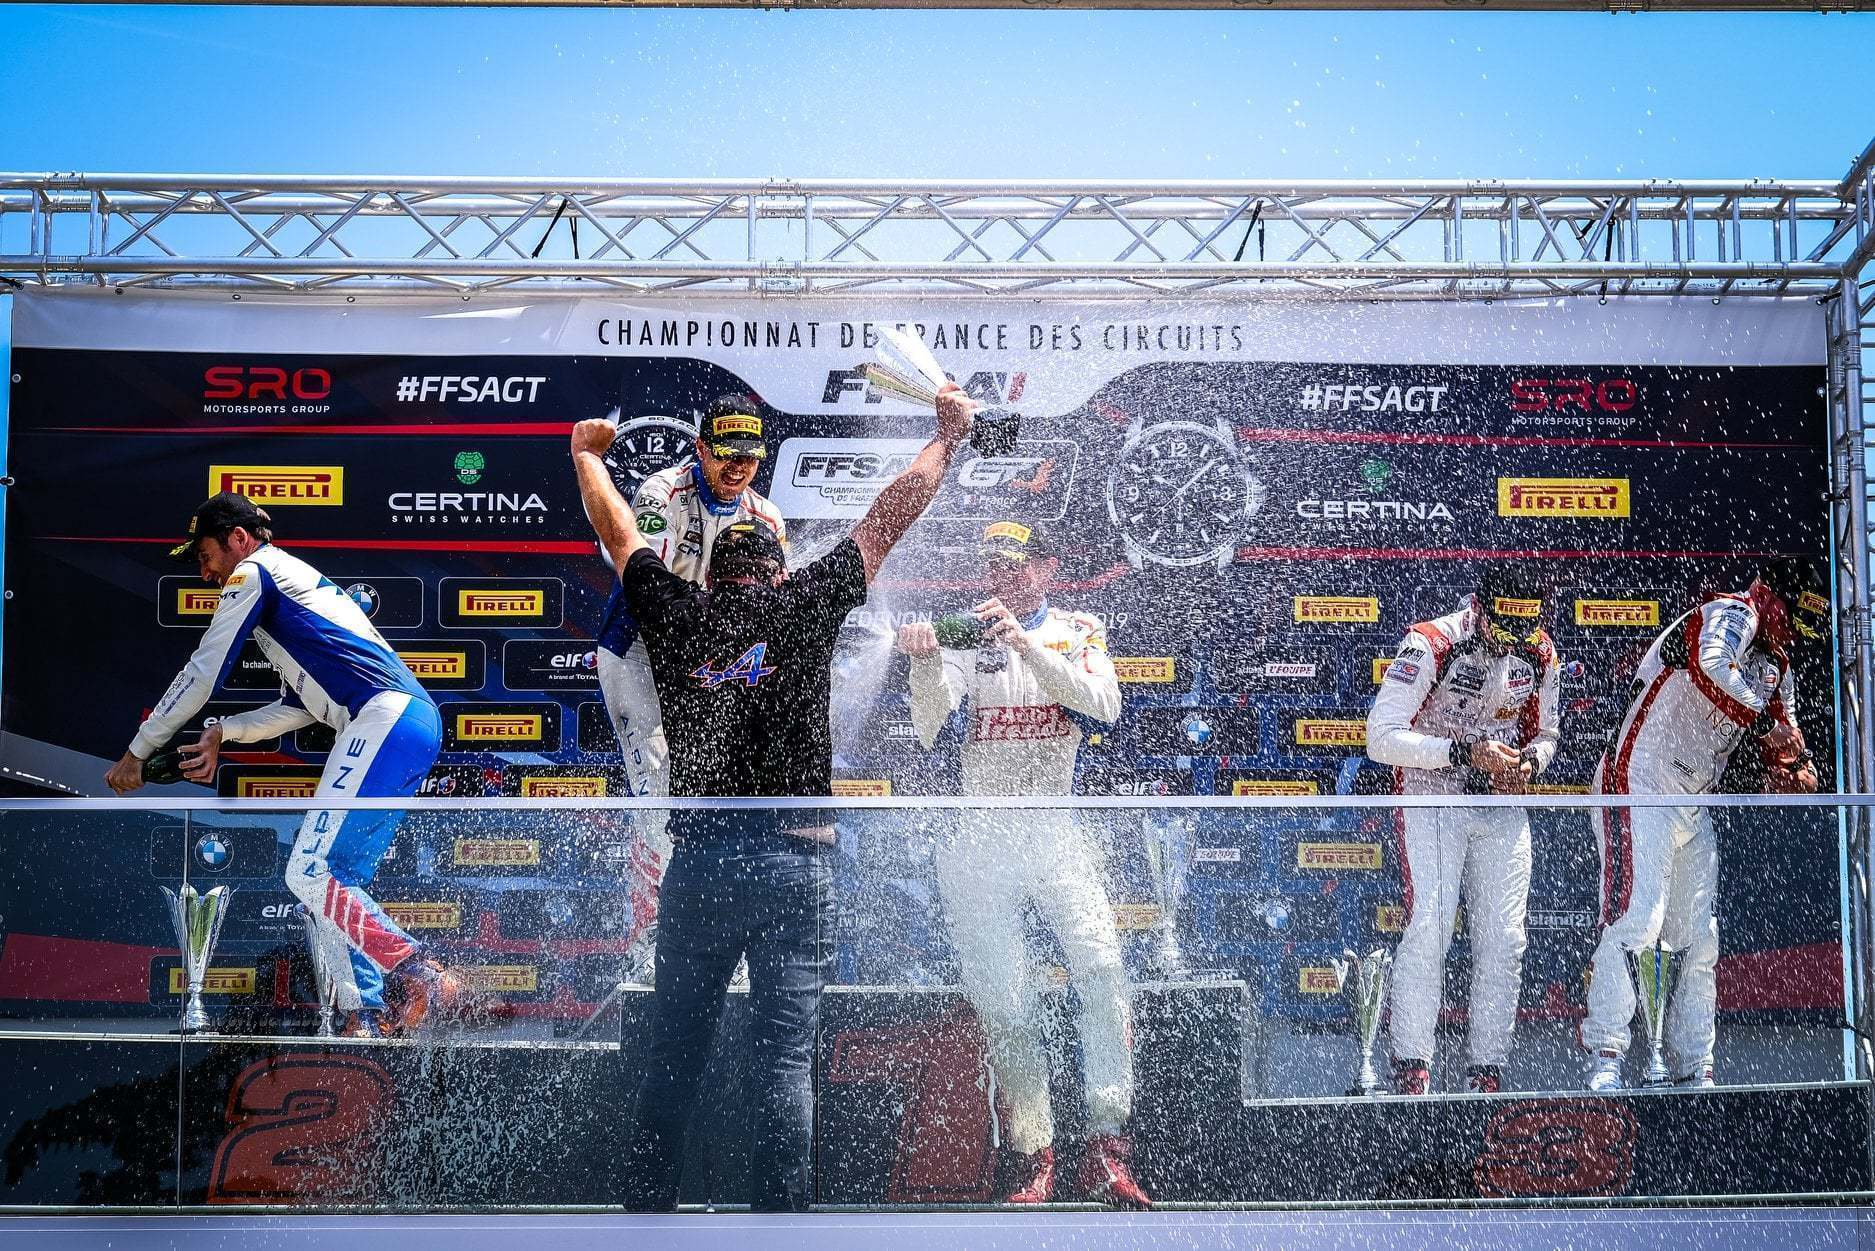 FFSA GT: CMR reprend la main Lédenon ! (Course 2) 3